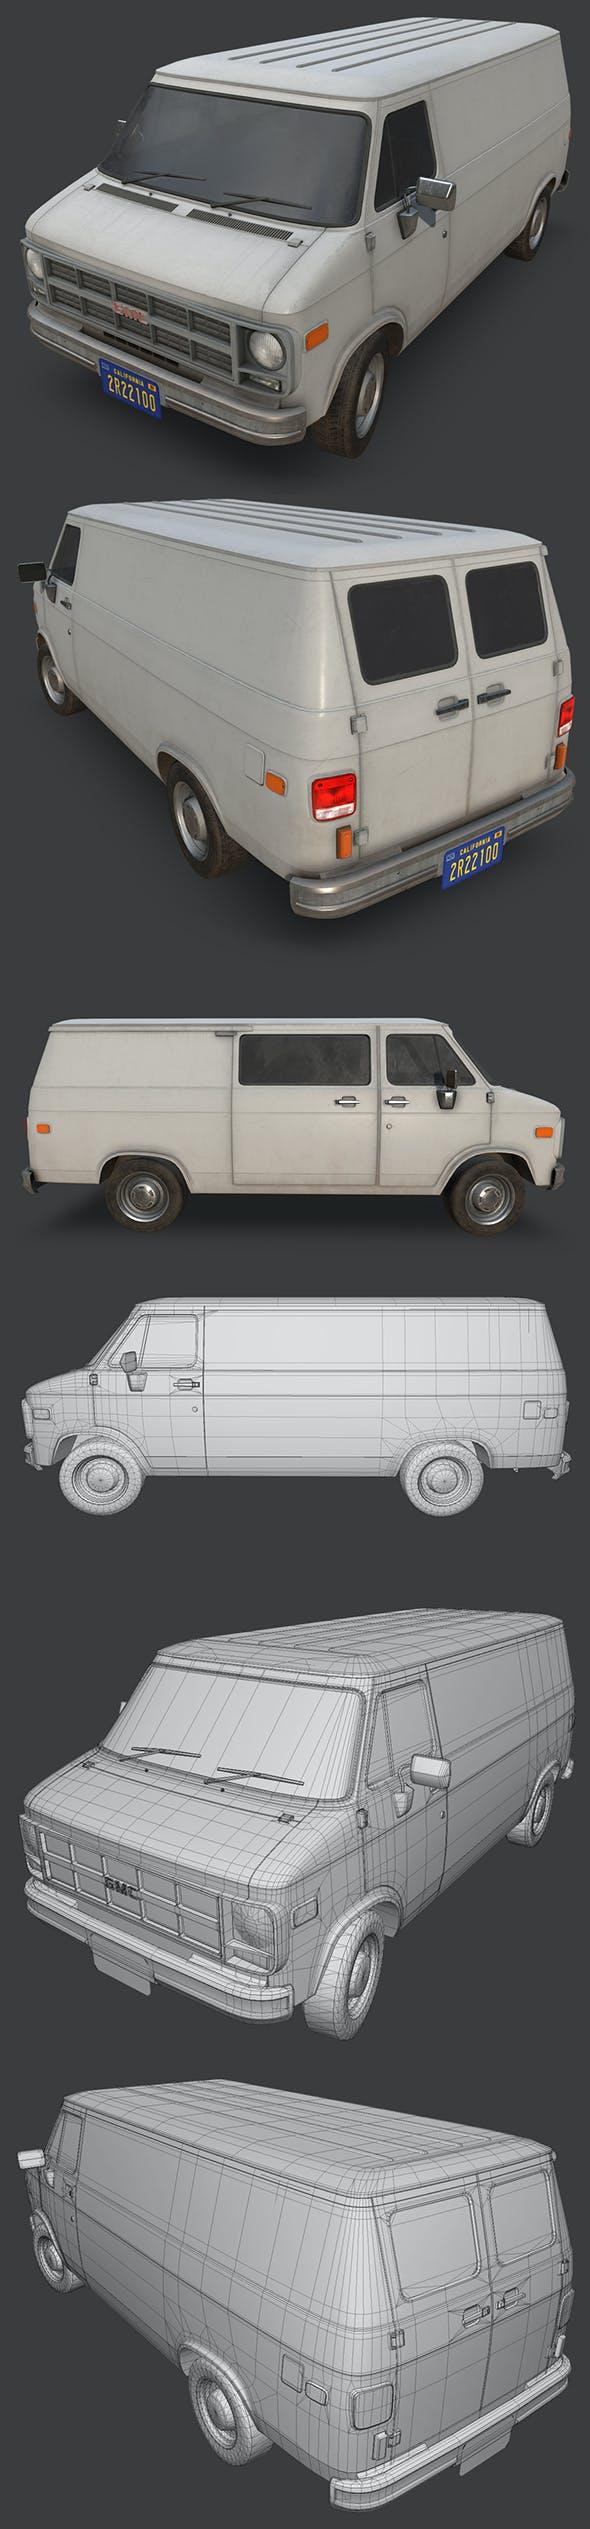 GMC Vandura Van 1994 - 3DOcean Item for Sale